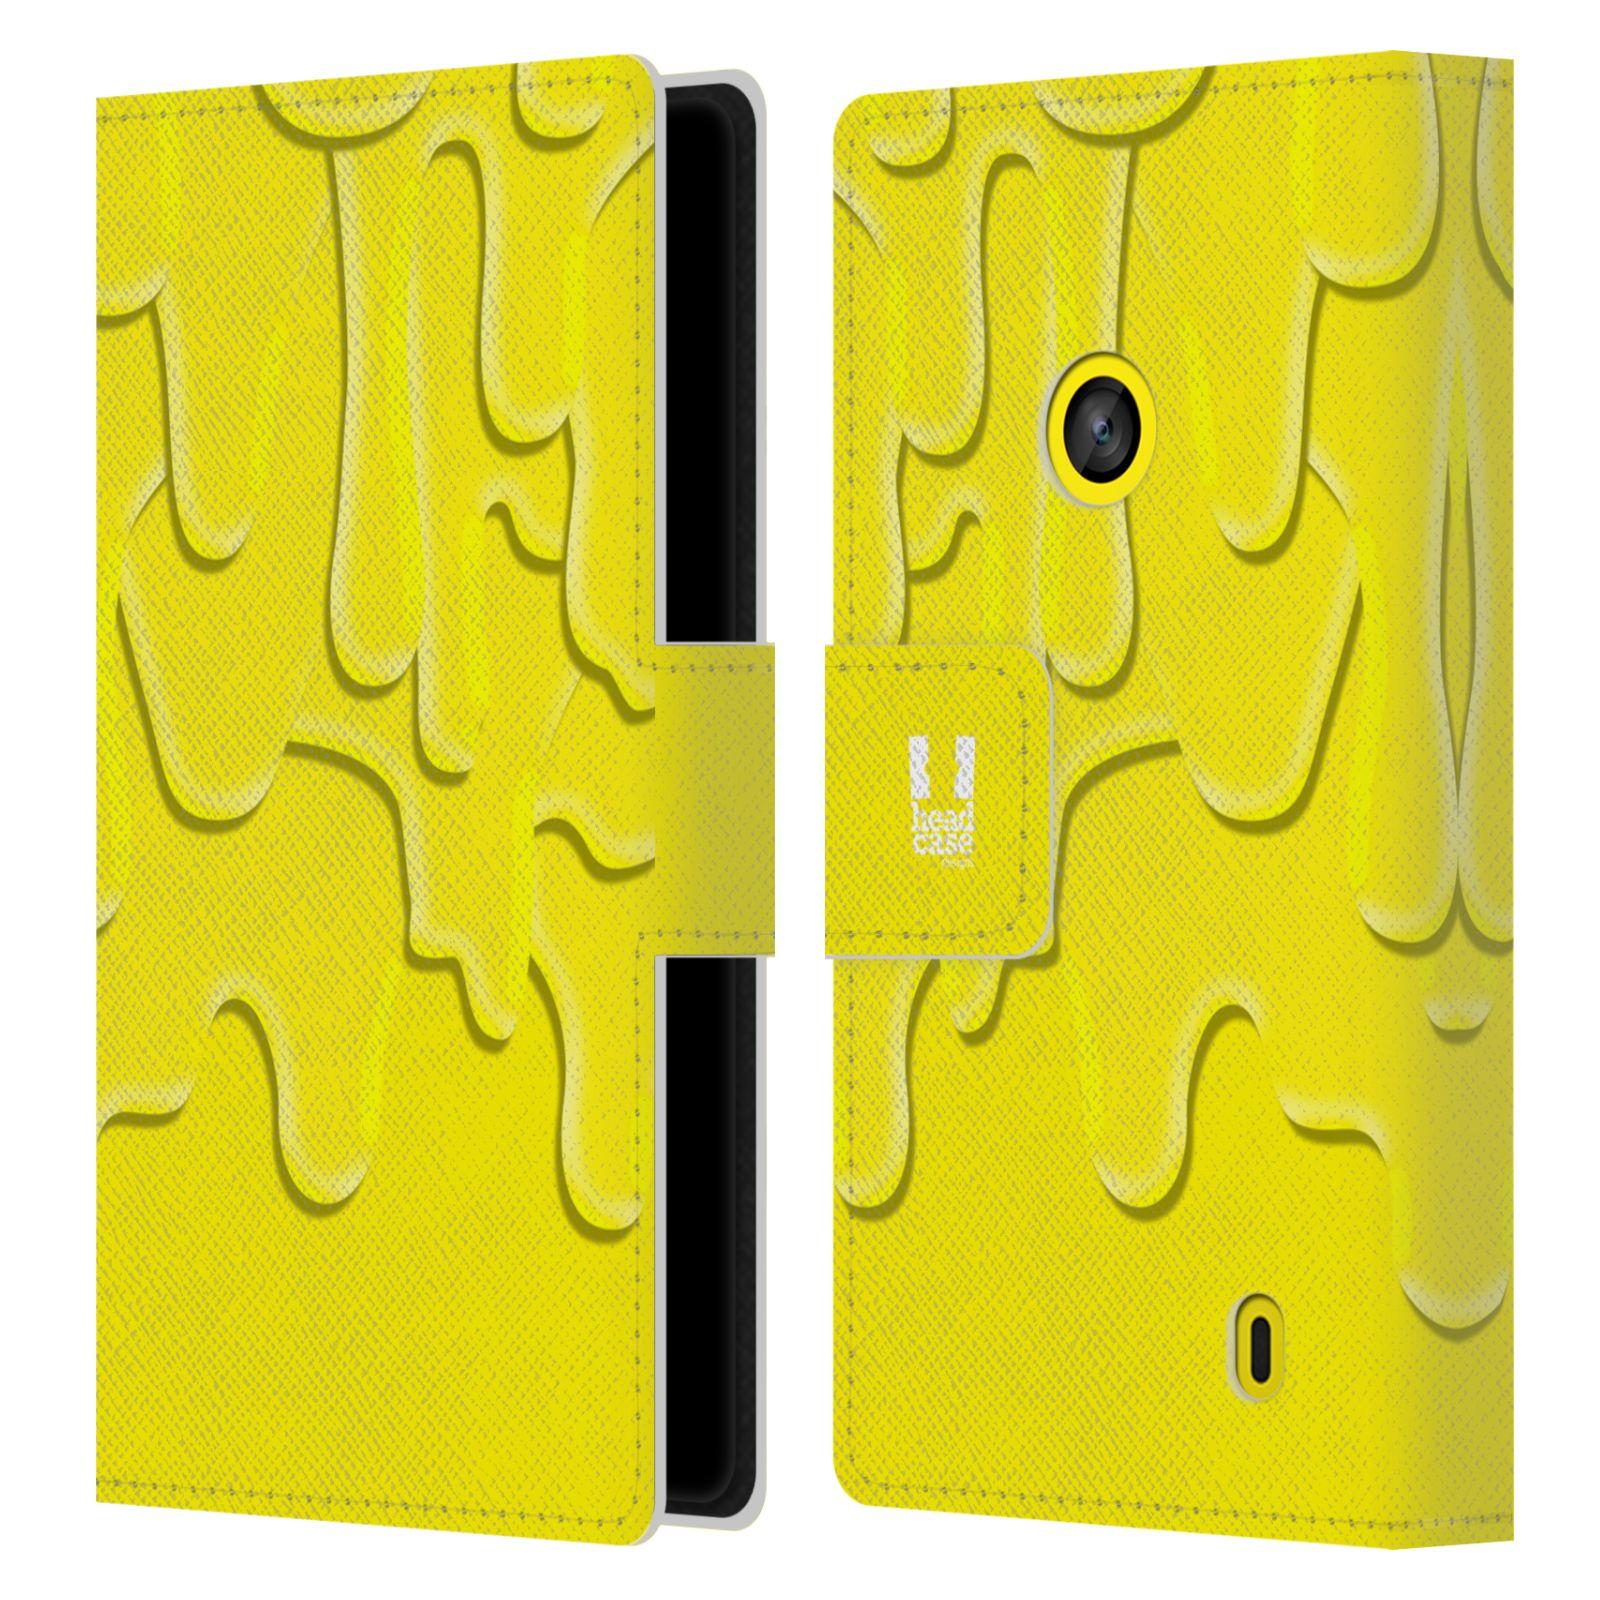 HEAD CASE Flipové pouzdro pro mobil NOKIA LUMIA 520 / 525 ZÁPLAVA BARVA žlutá